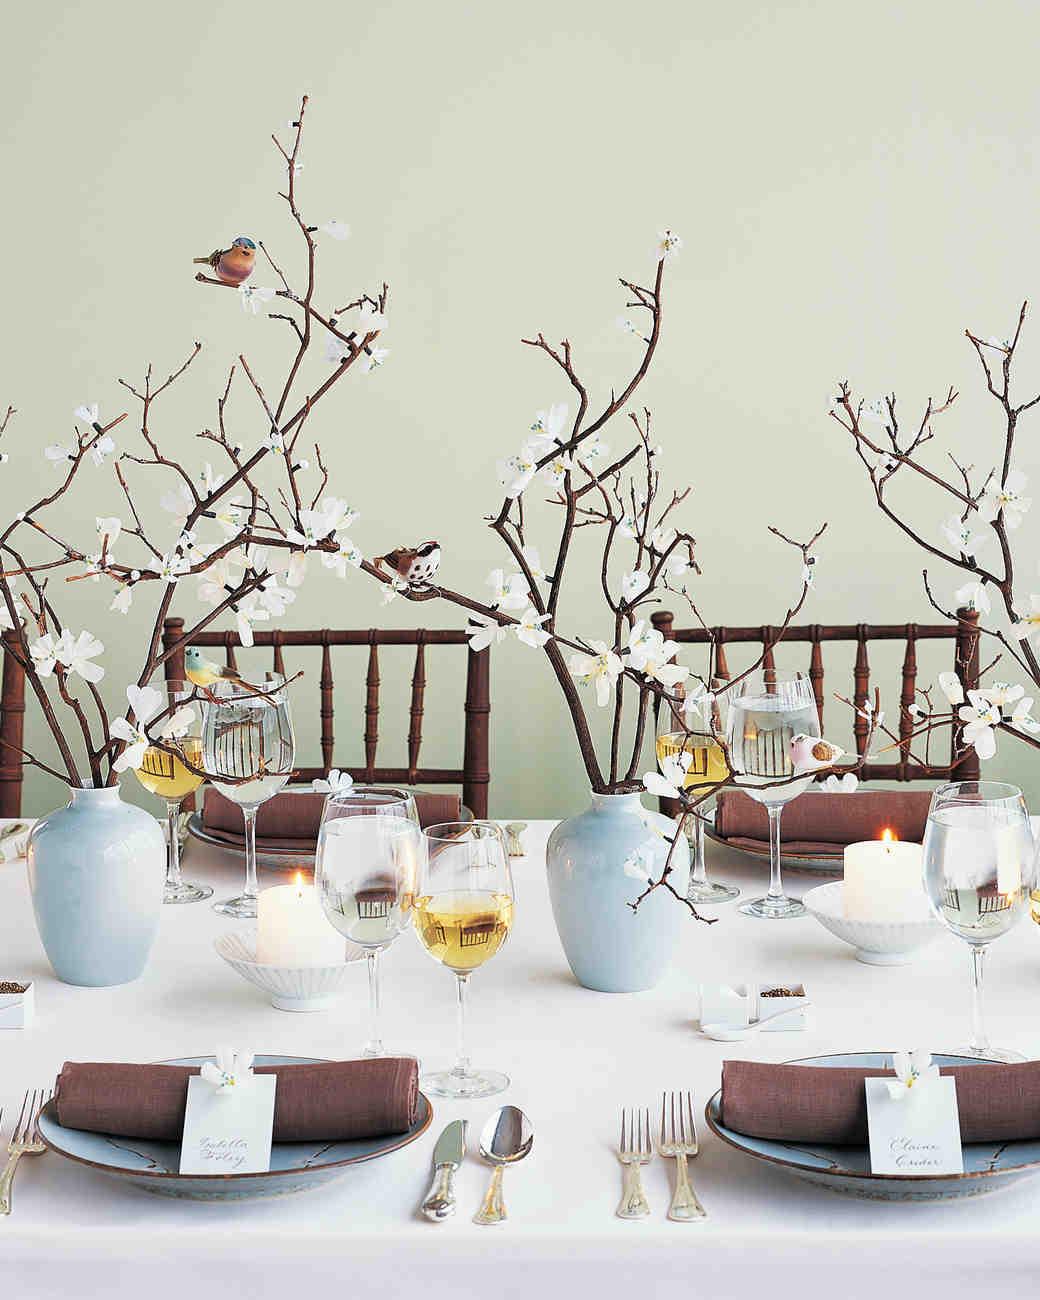 23 diy wedding centerpieces we love martha stewart weddings rh marthastewartweddings com